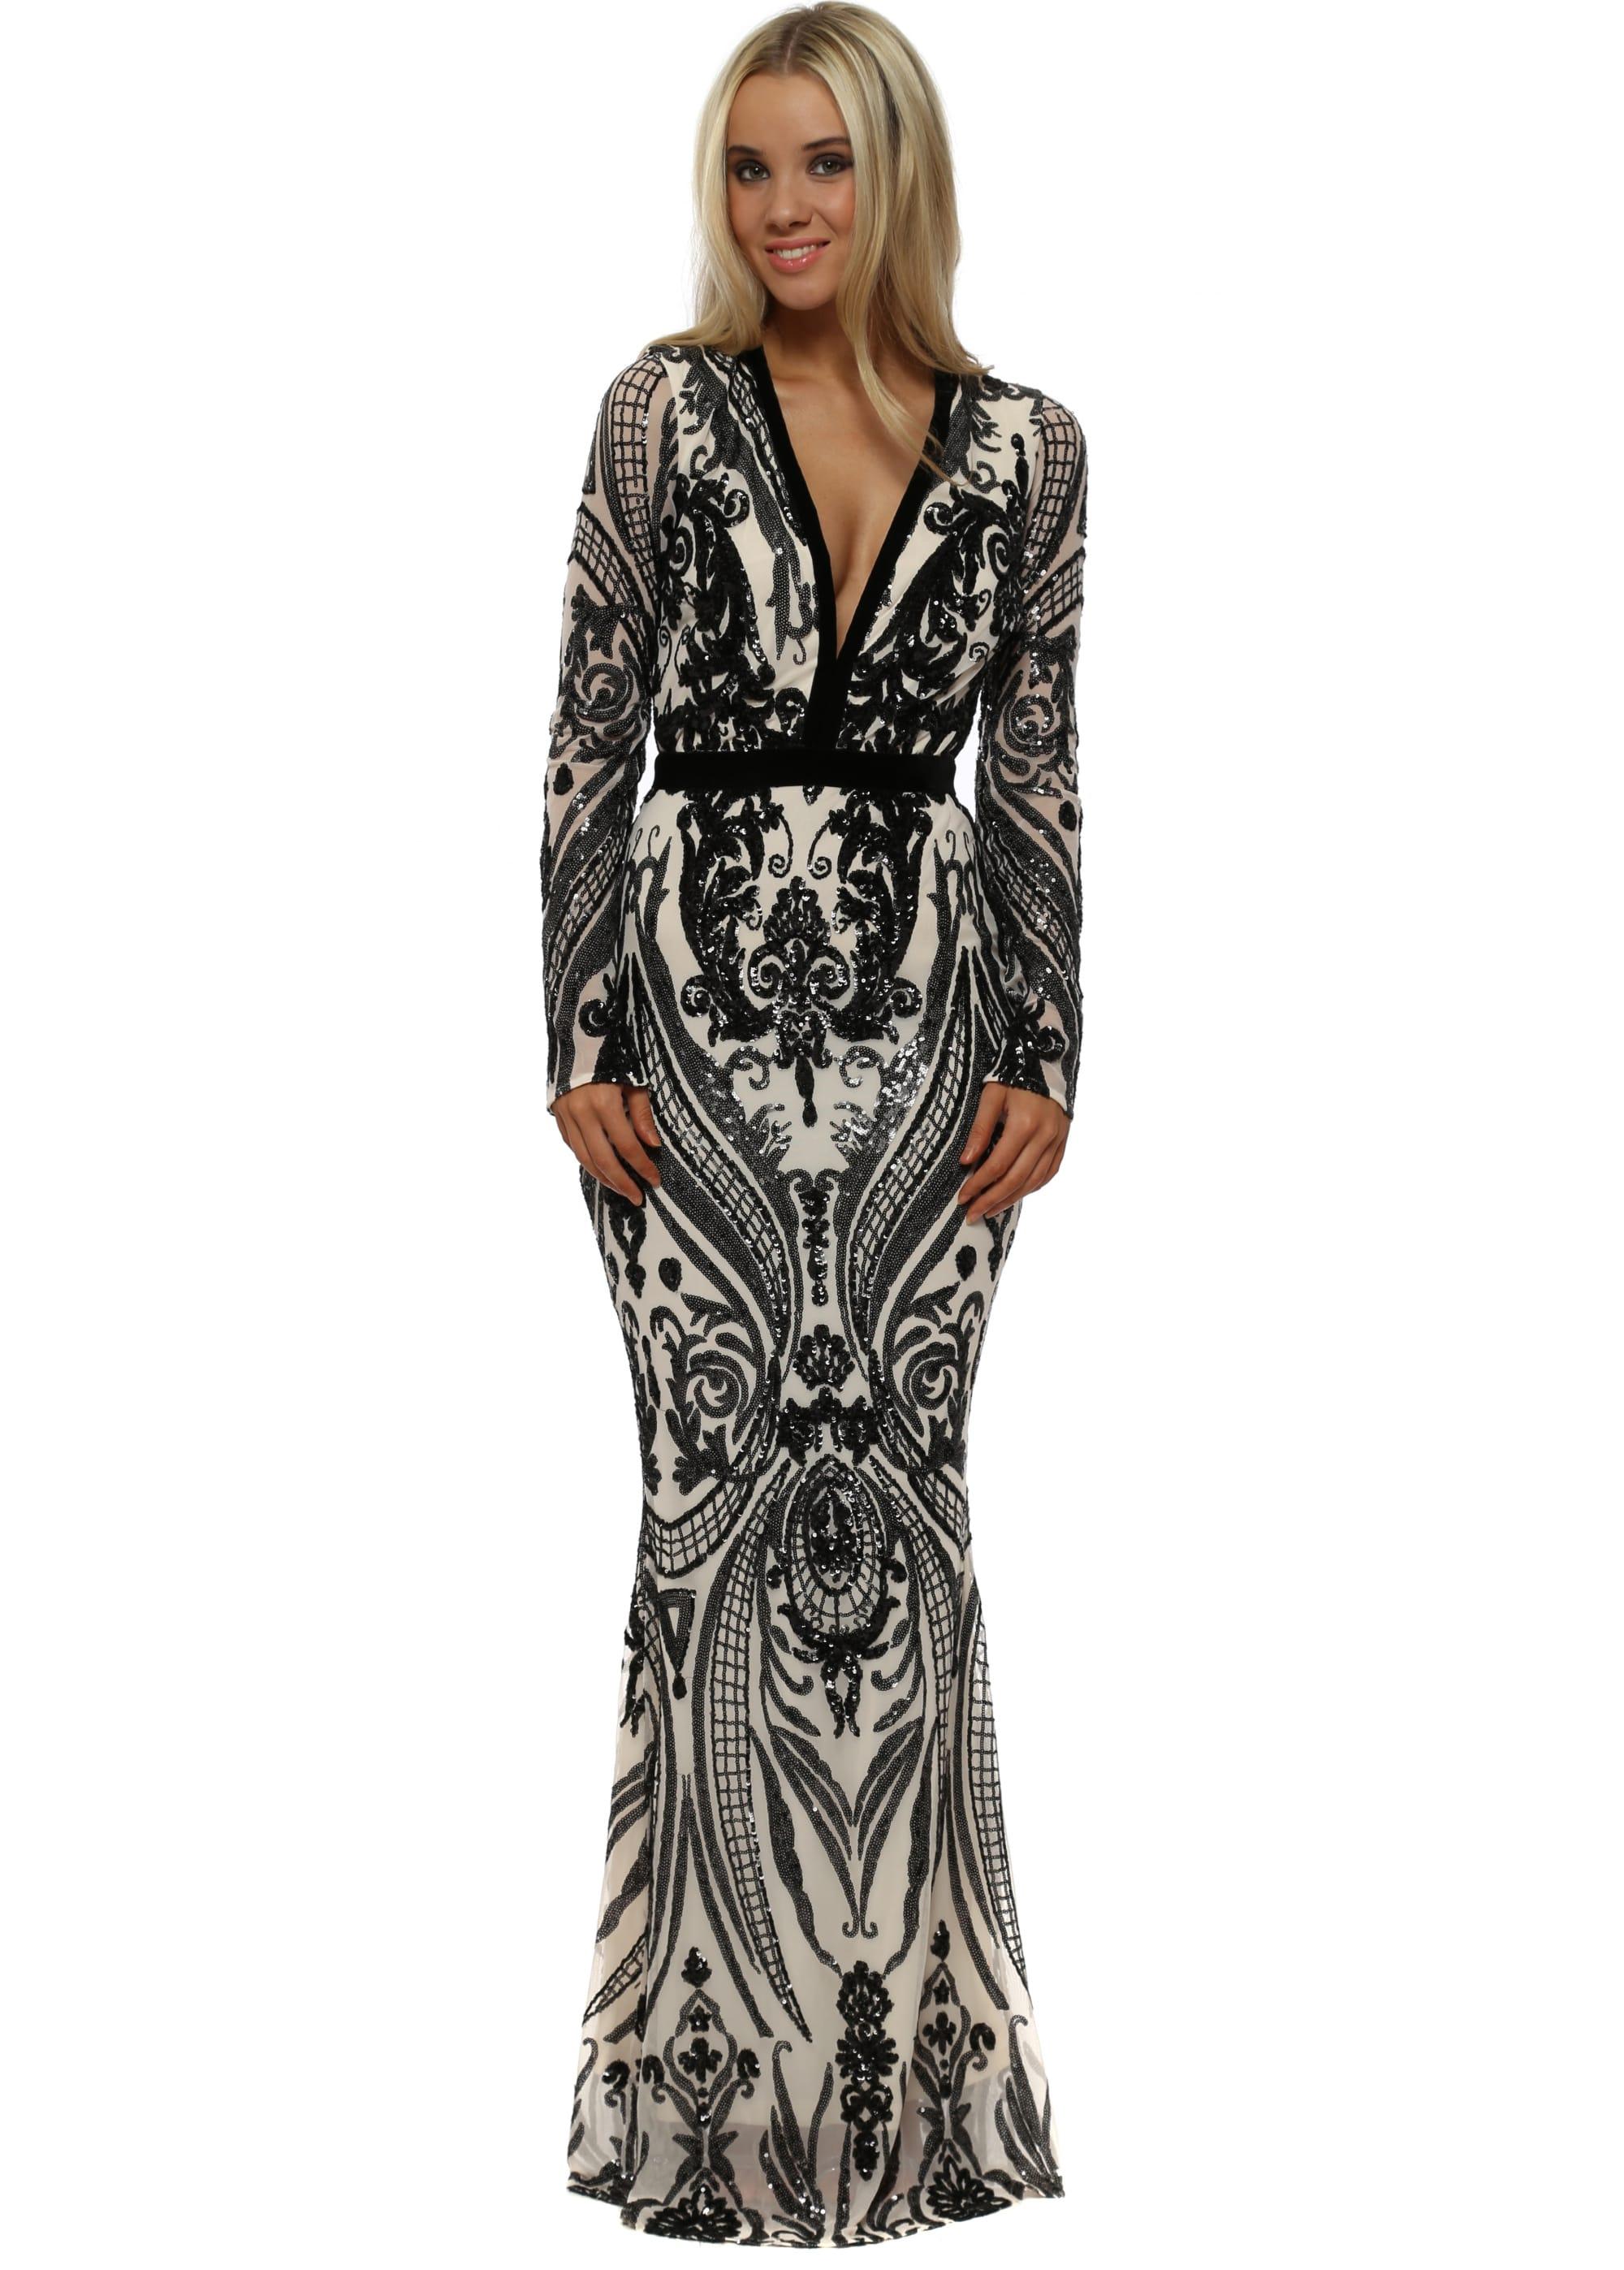 Stephanie Pratt Plunge Front Sequin Maxi Dress